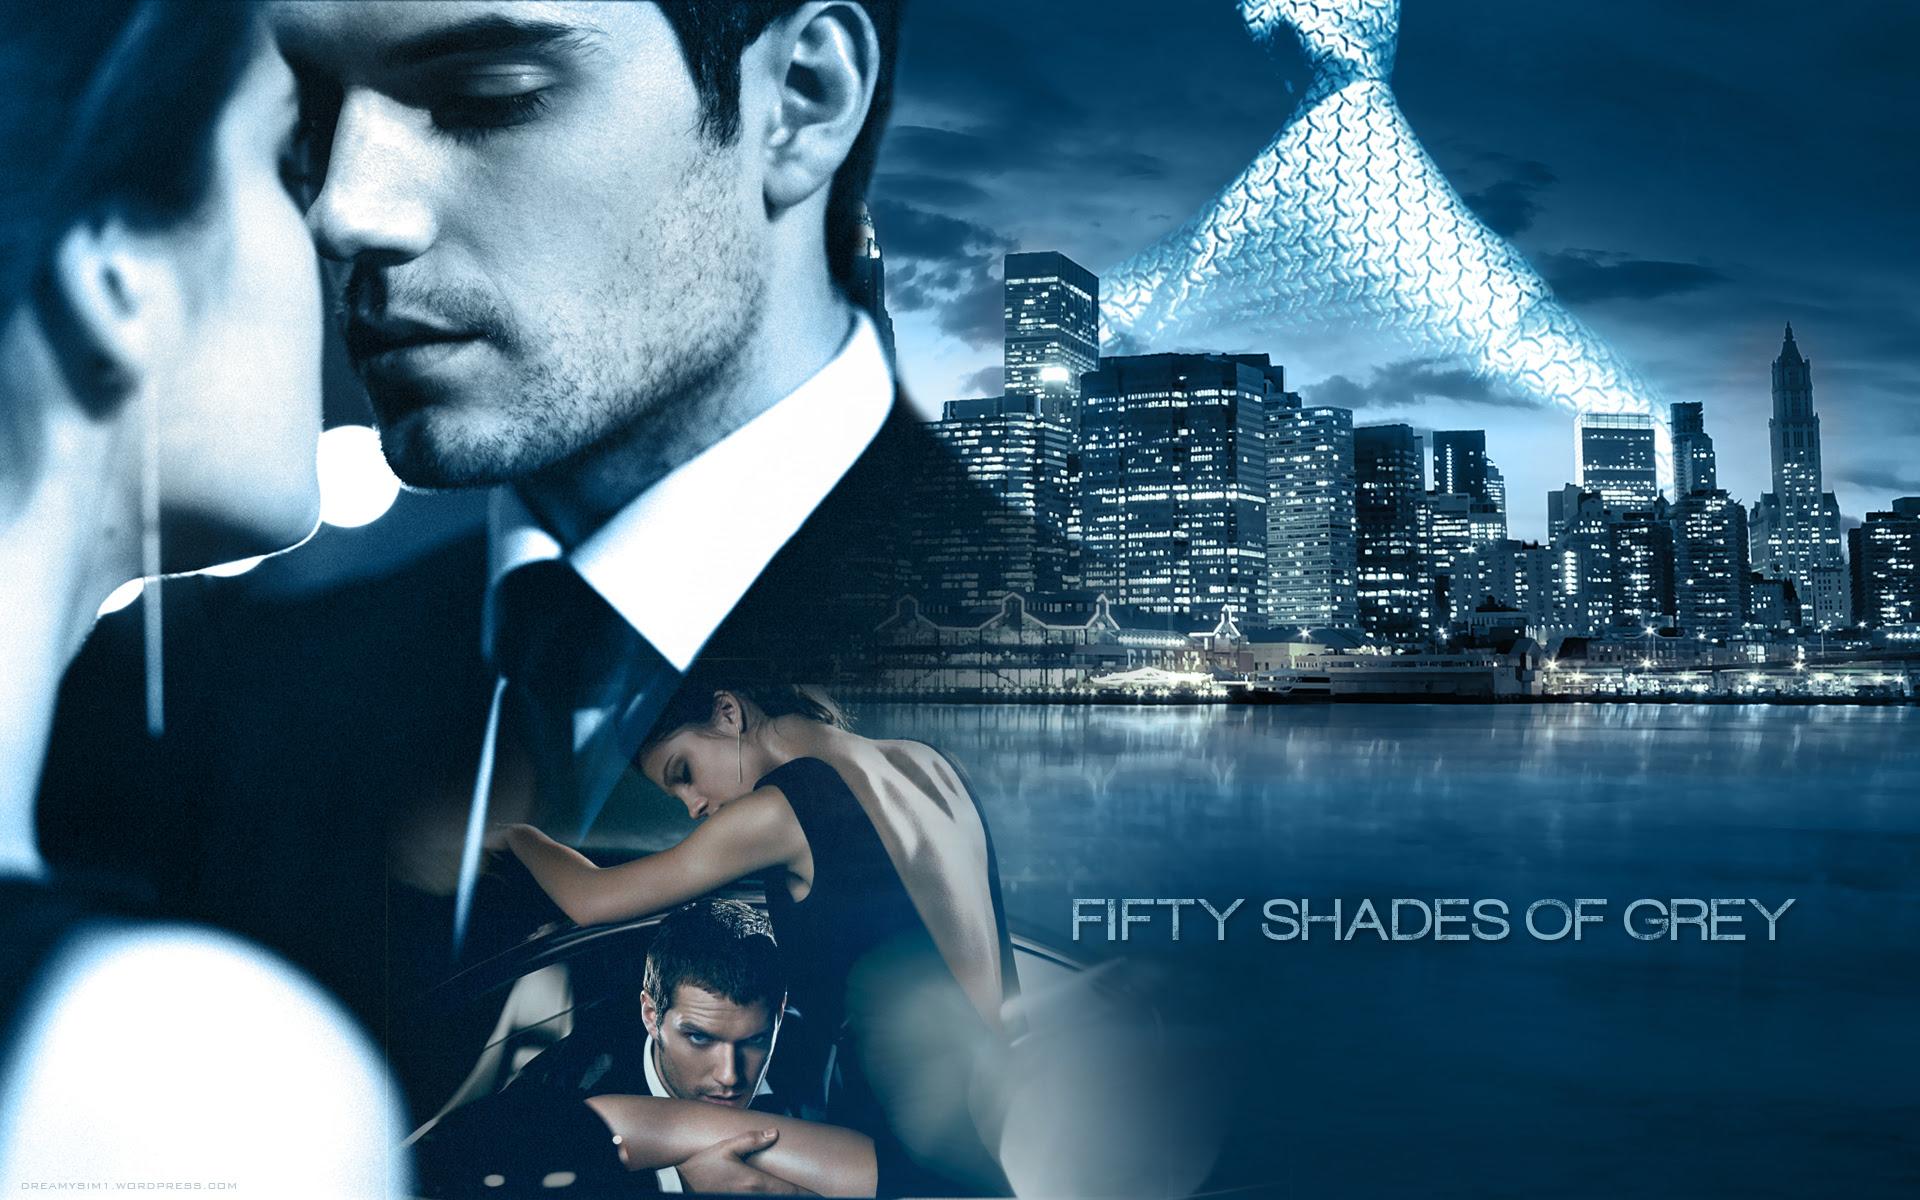 Fifty Shades Of Grey Fifty Shades Of Grey Wallpaper 33869274